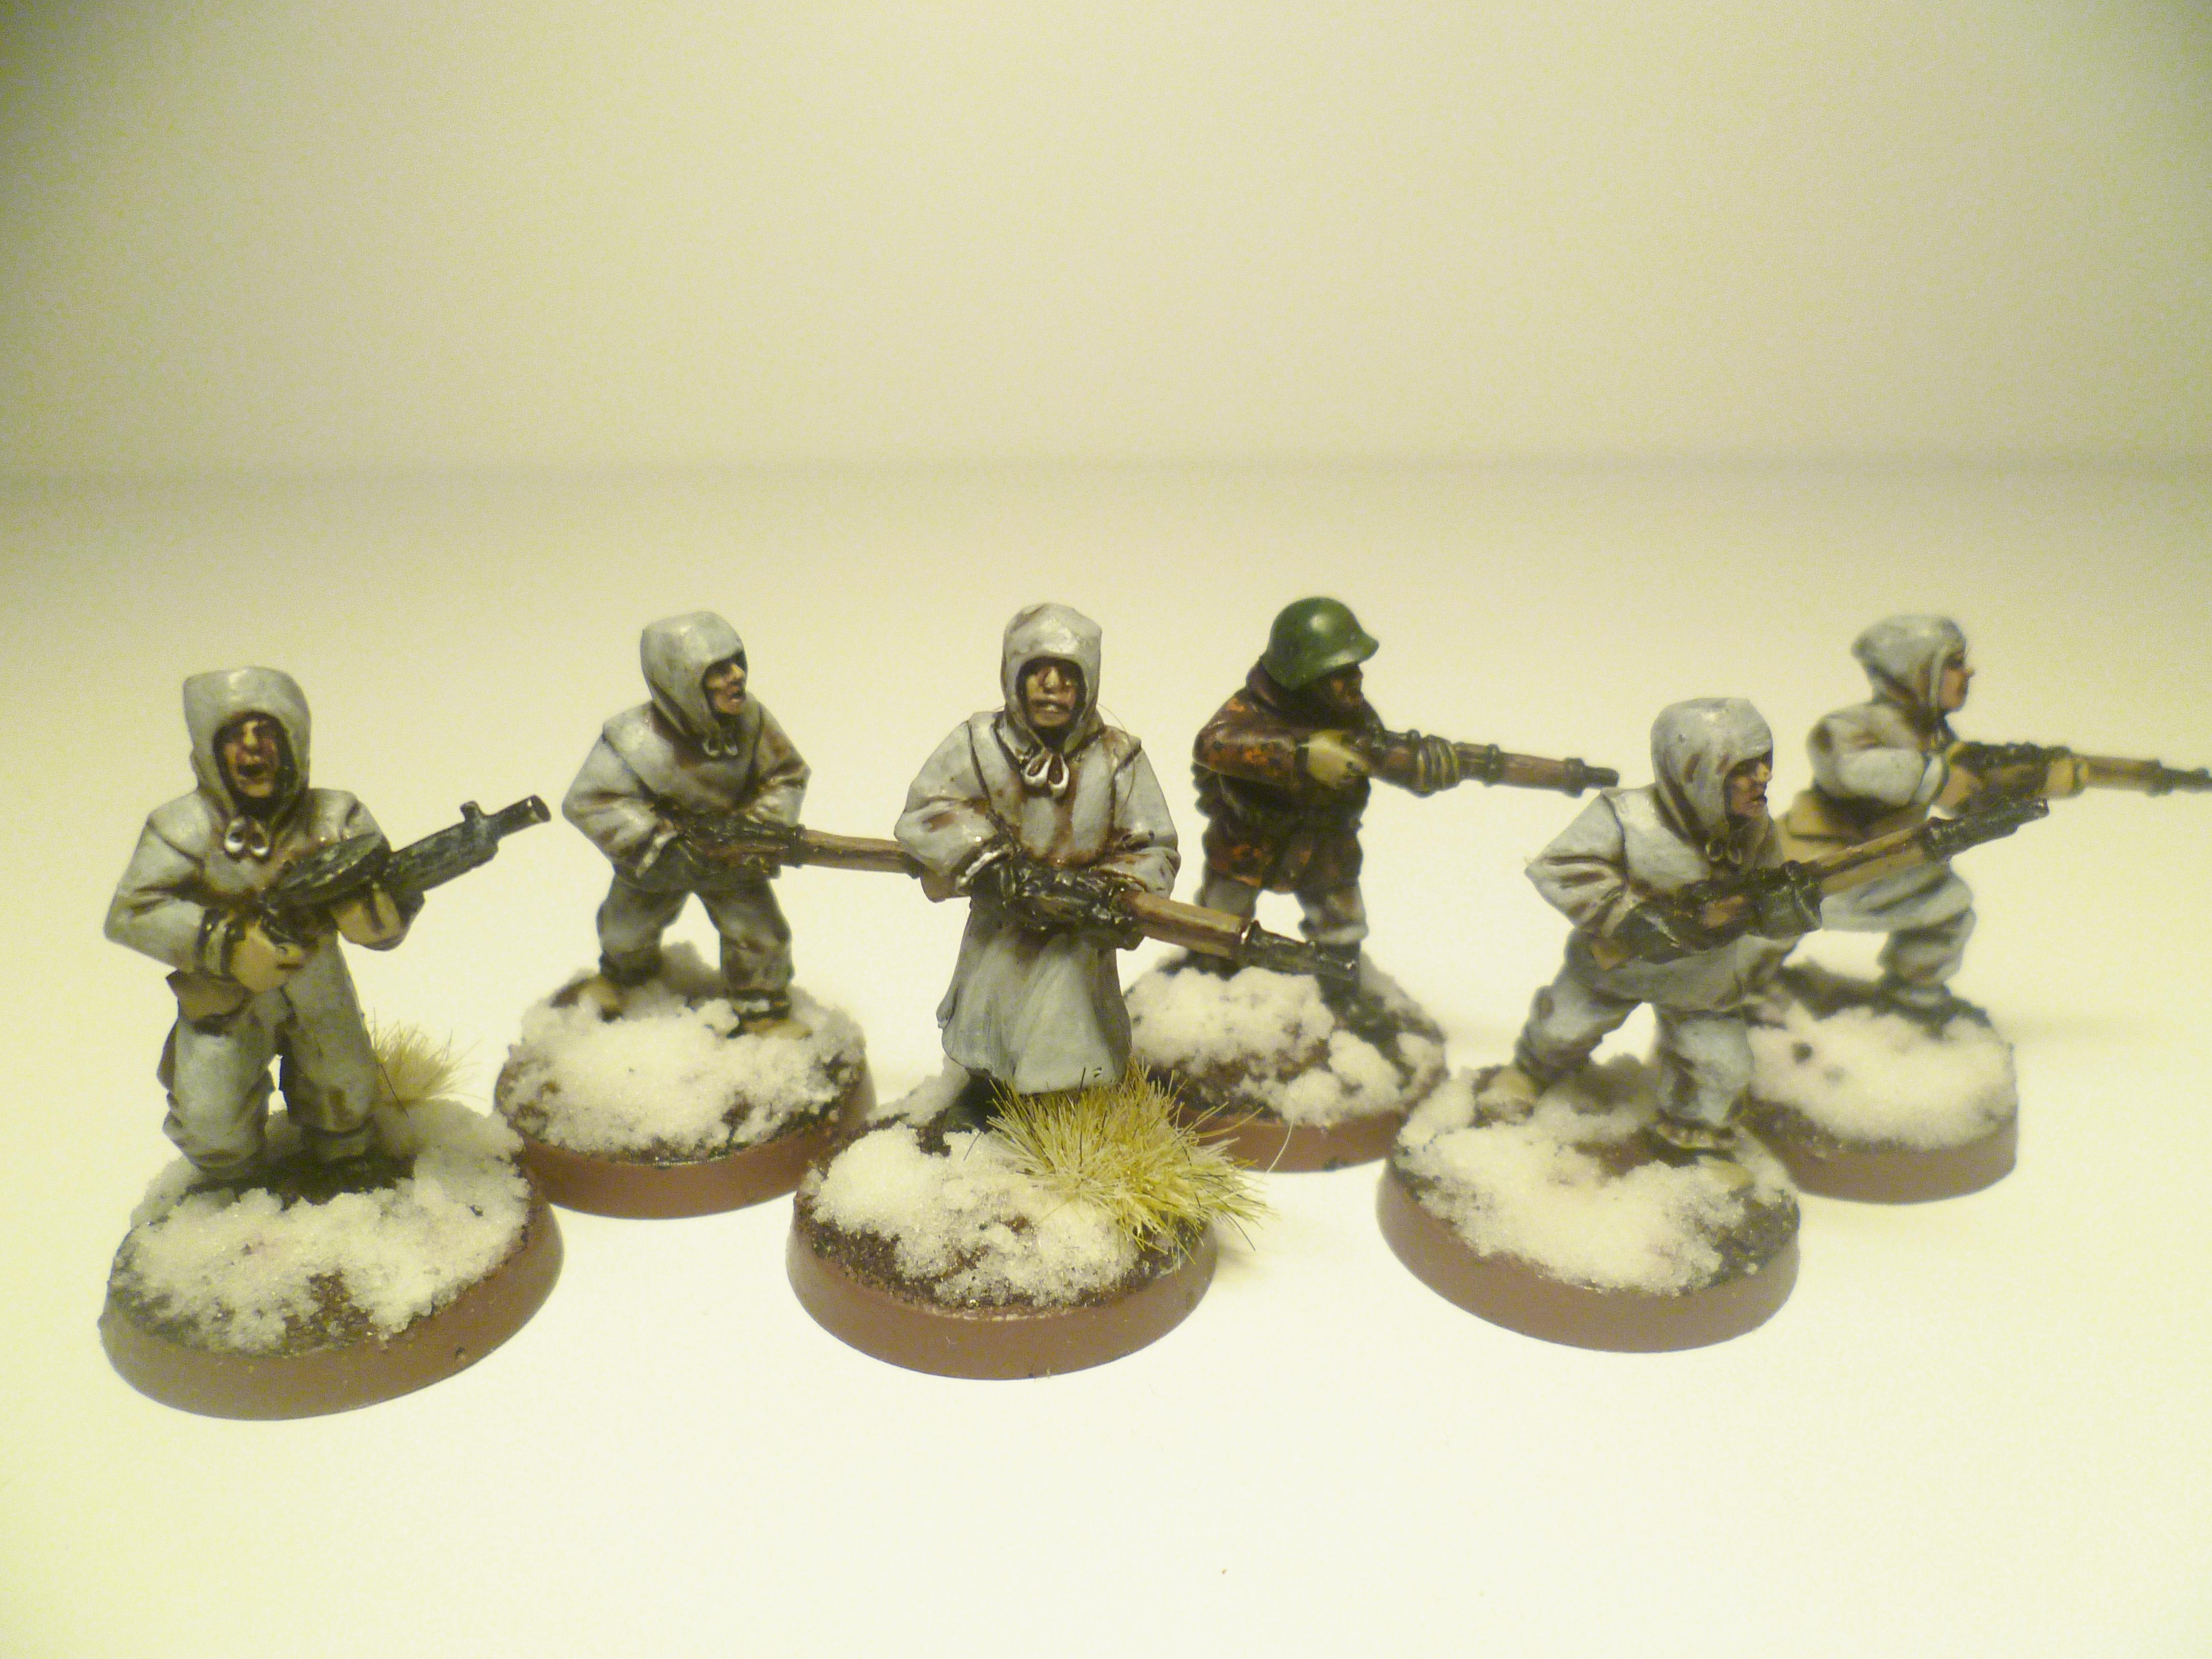 Soviet Infantry in Winter Clothing